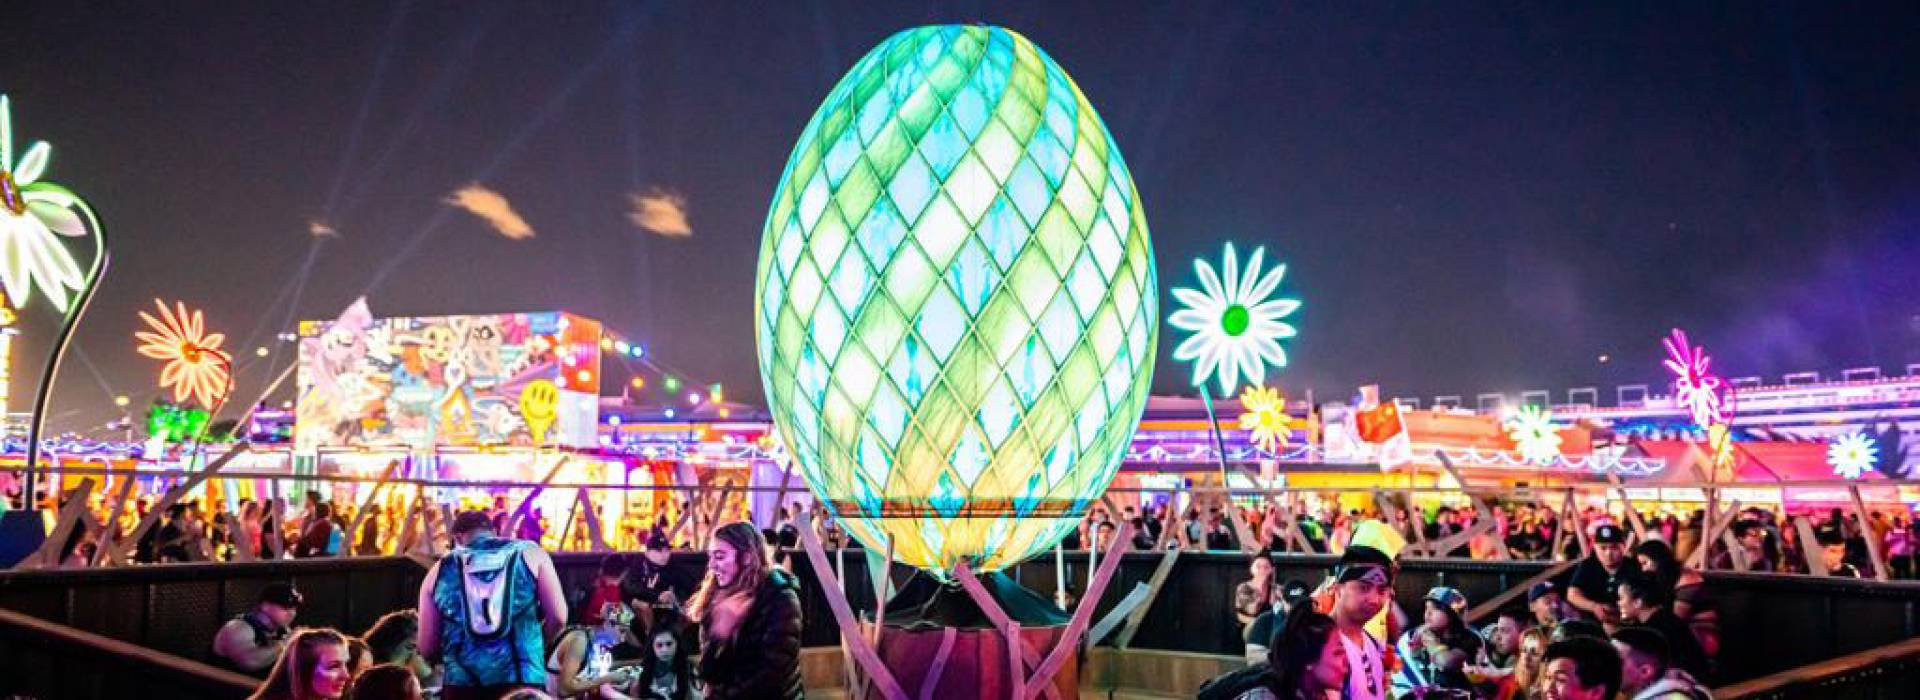 X-Treme Creations Owl's nest - EDC Las Vegas